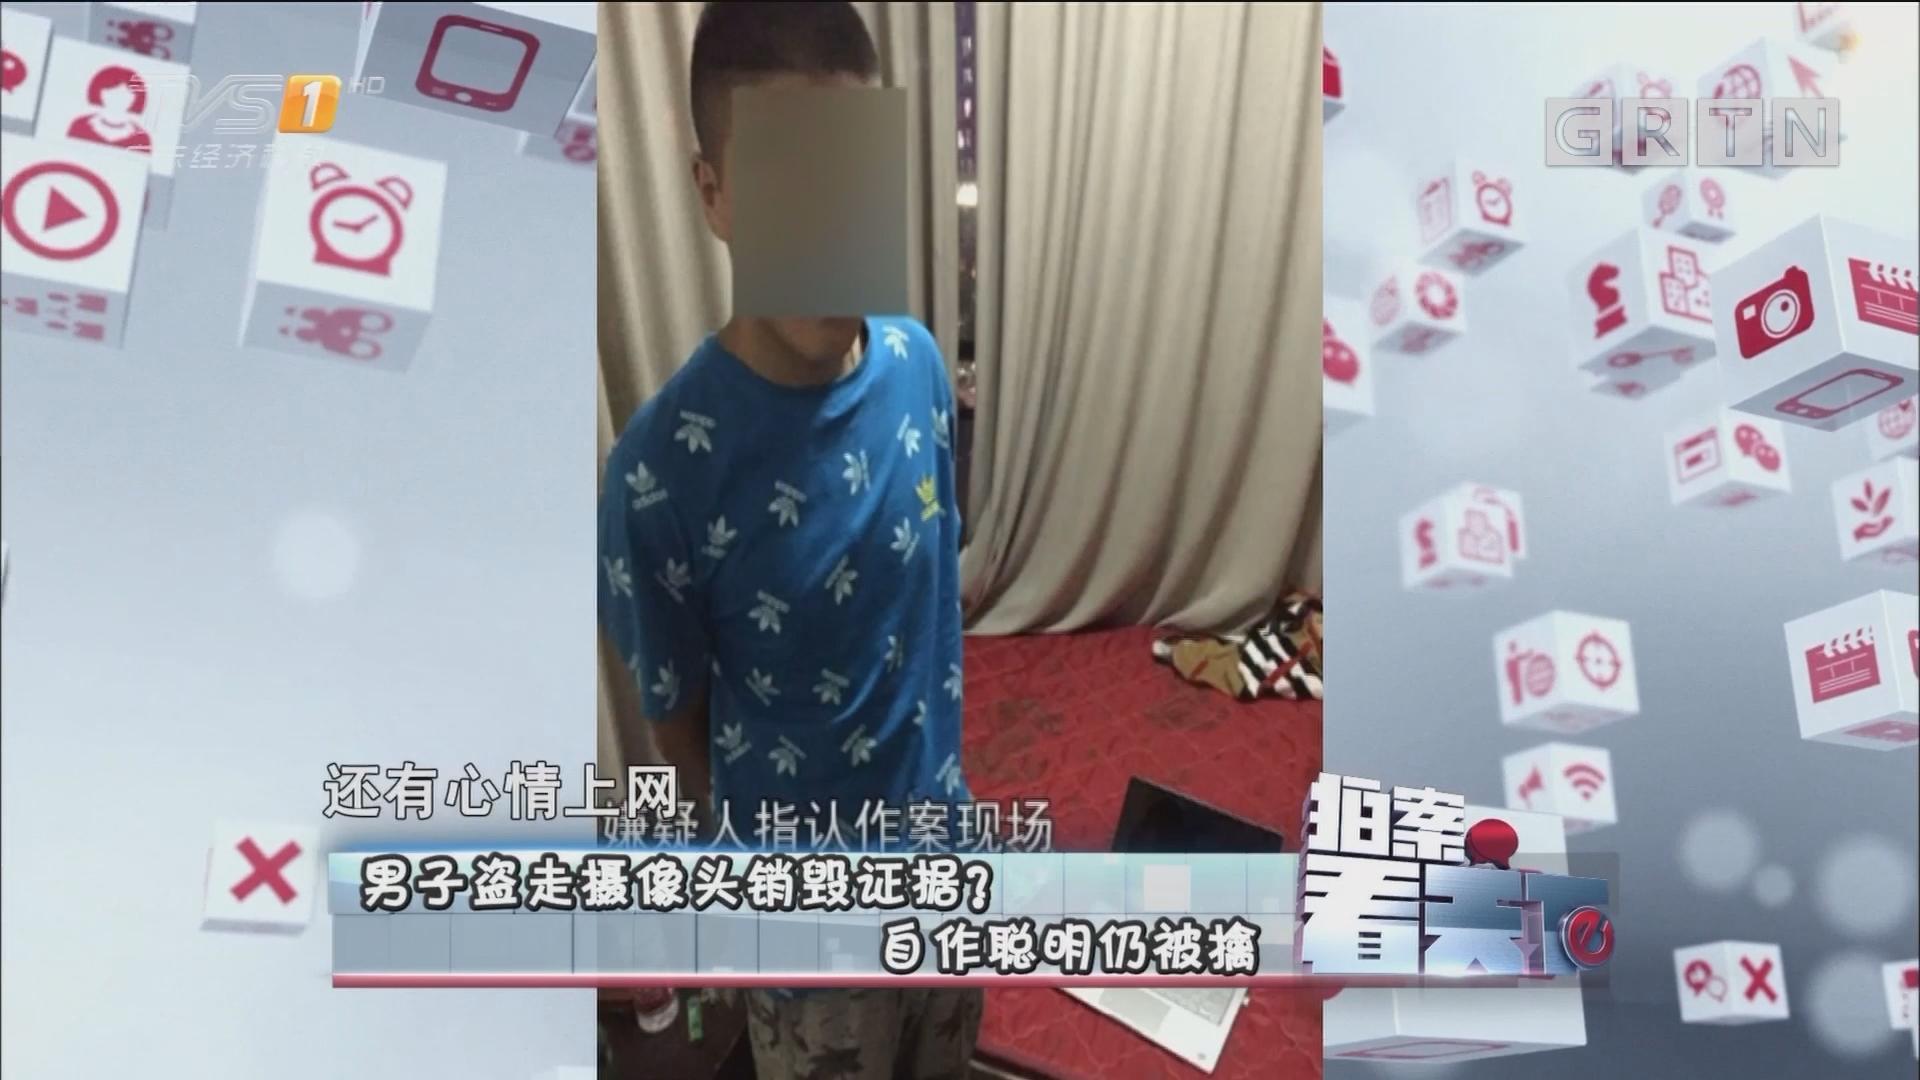 [HD][2017-08-01]拍案看天下:男子盗走摄像头销毁证据?自作聪明仍被擒